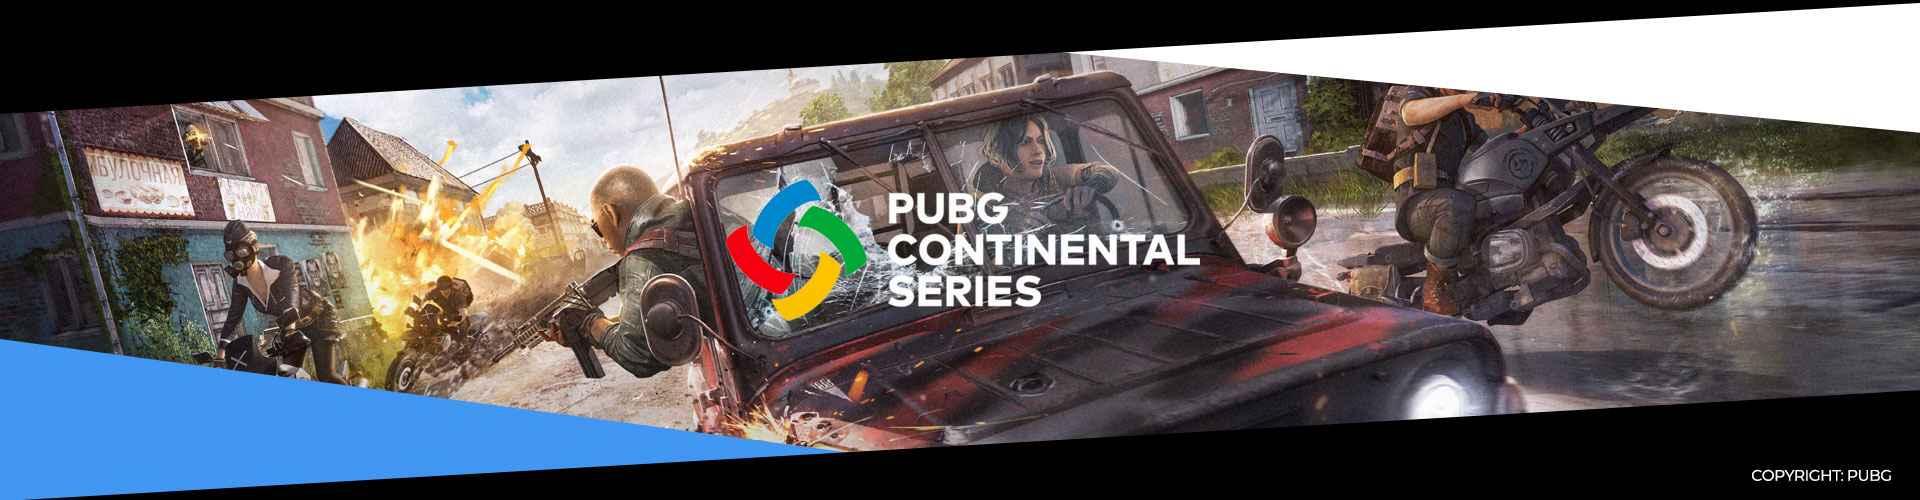 PUBG Continental Series (PCS) 2 - Europe